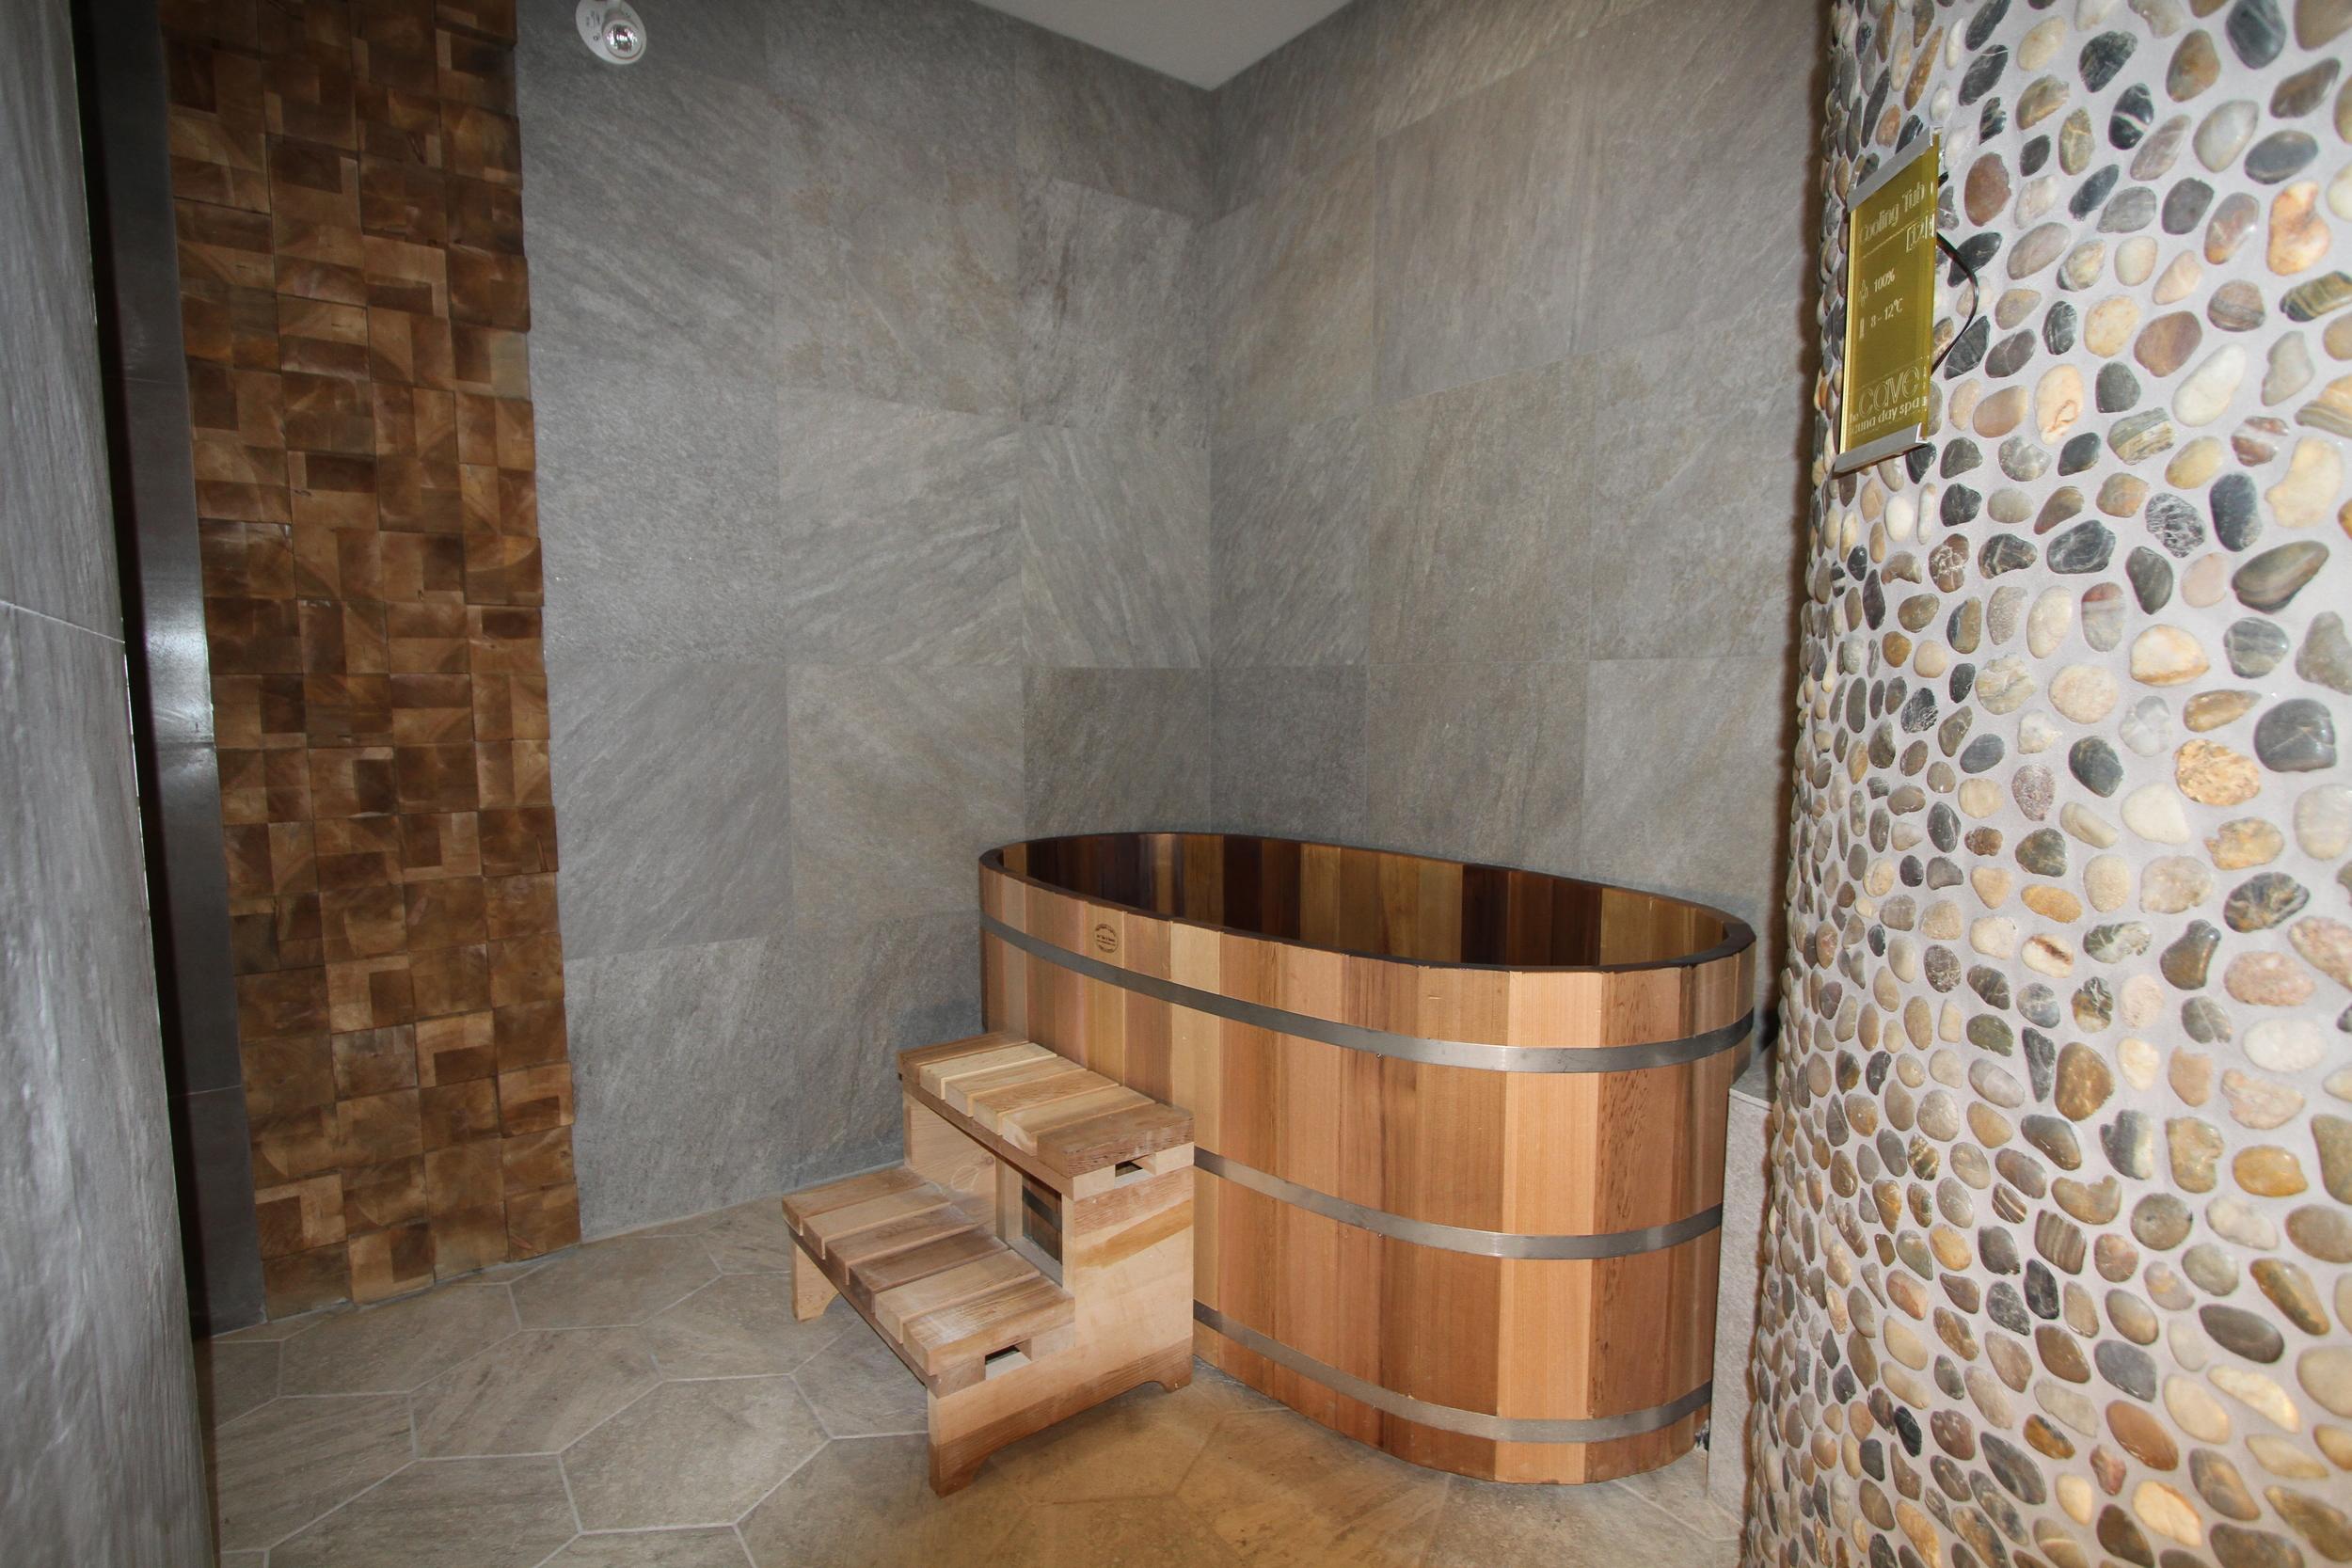 cooling tub.JPG